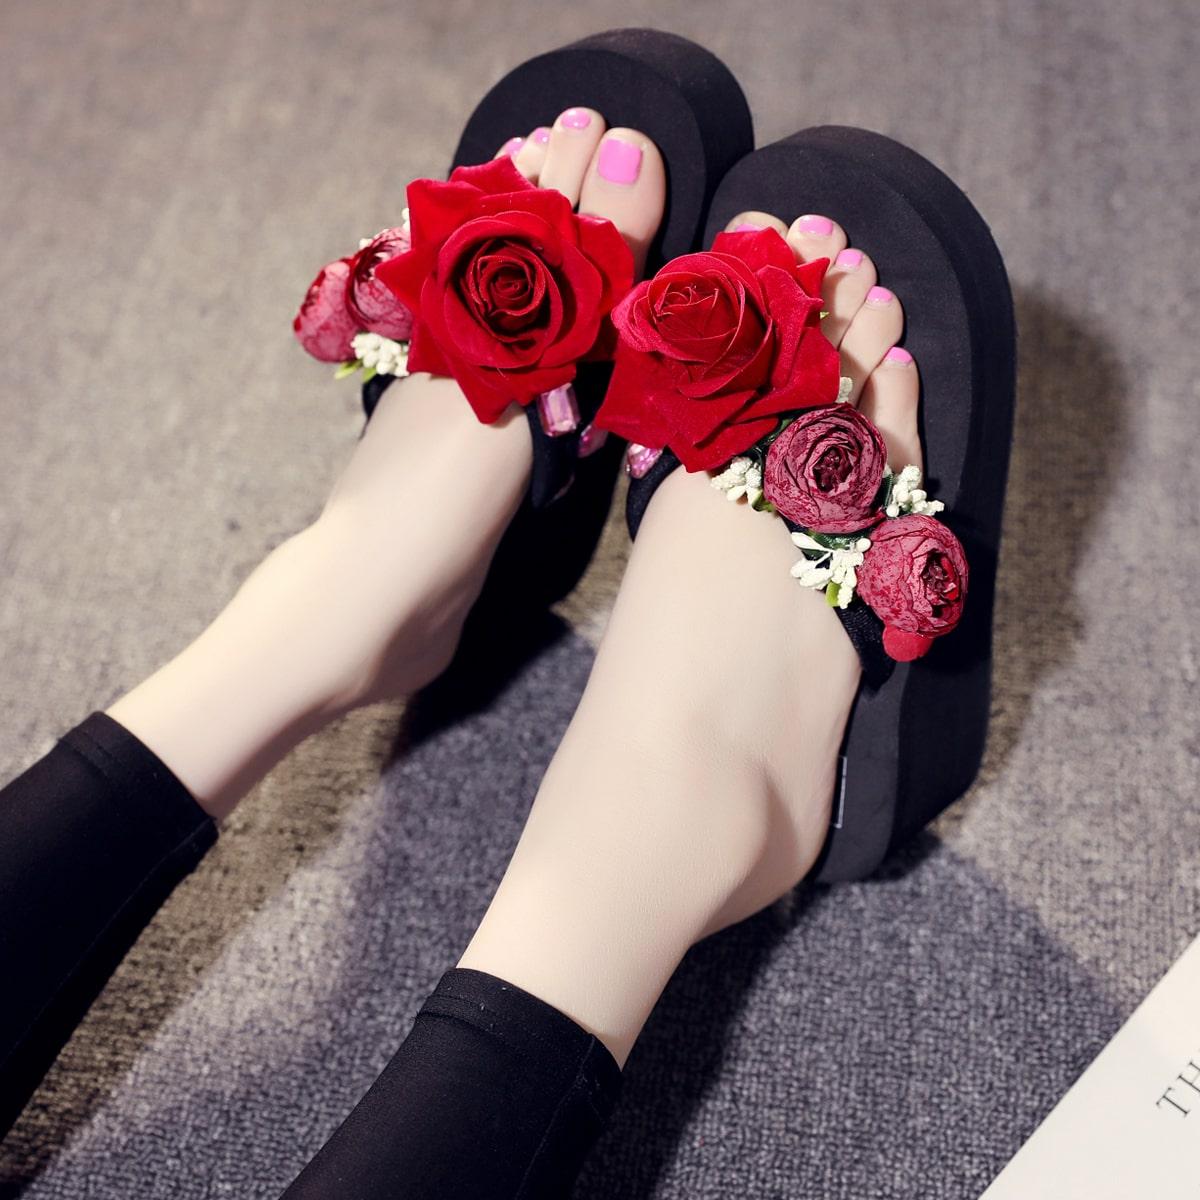 Вьетнамки с аппликациями в форме розовых цветов SheIn swshoes25210524071